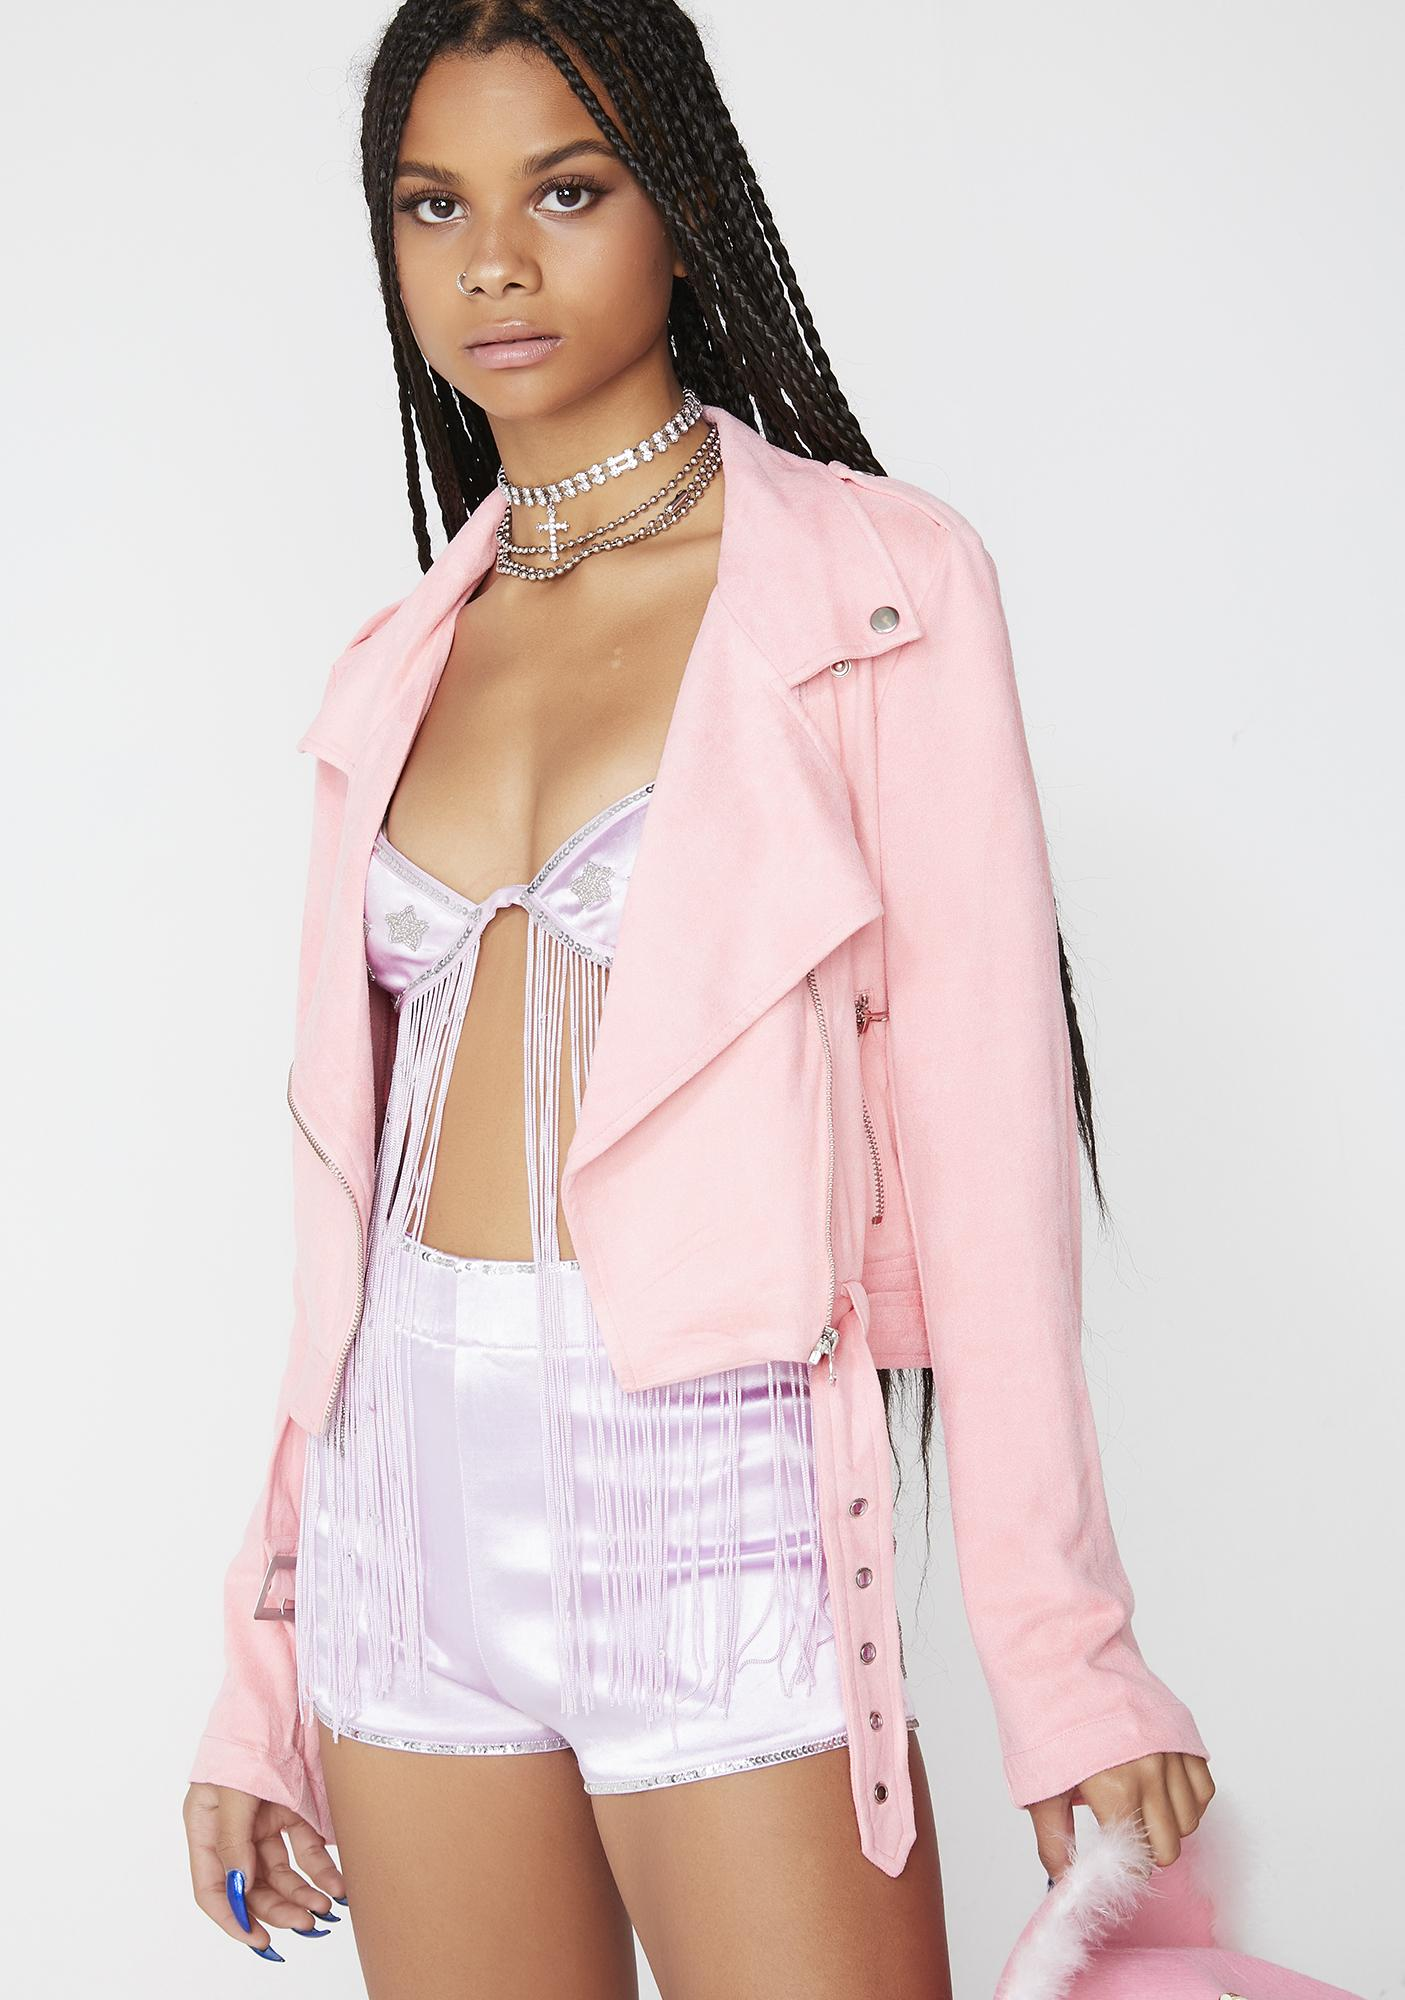 Berry Bitty Babe Moto Jacket